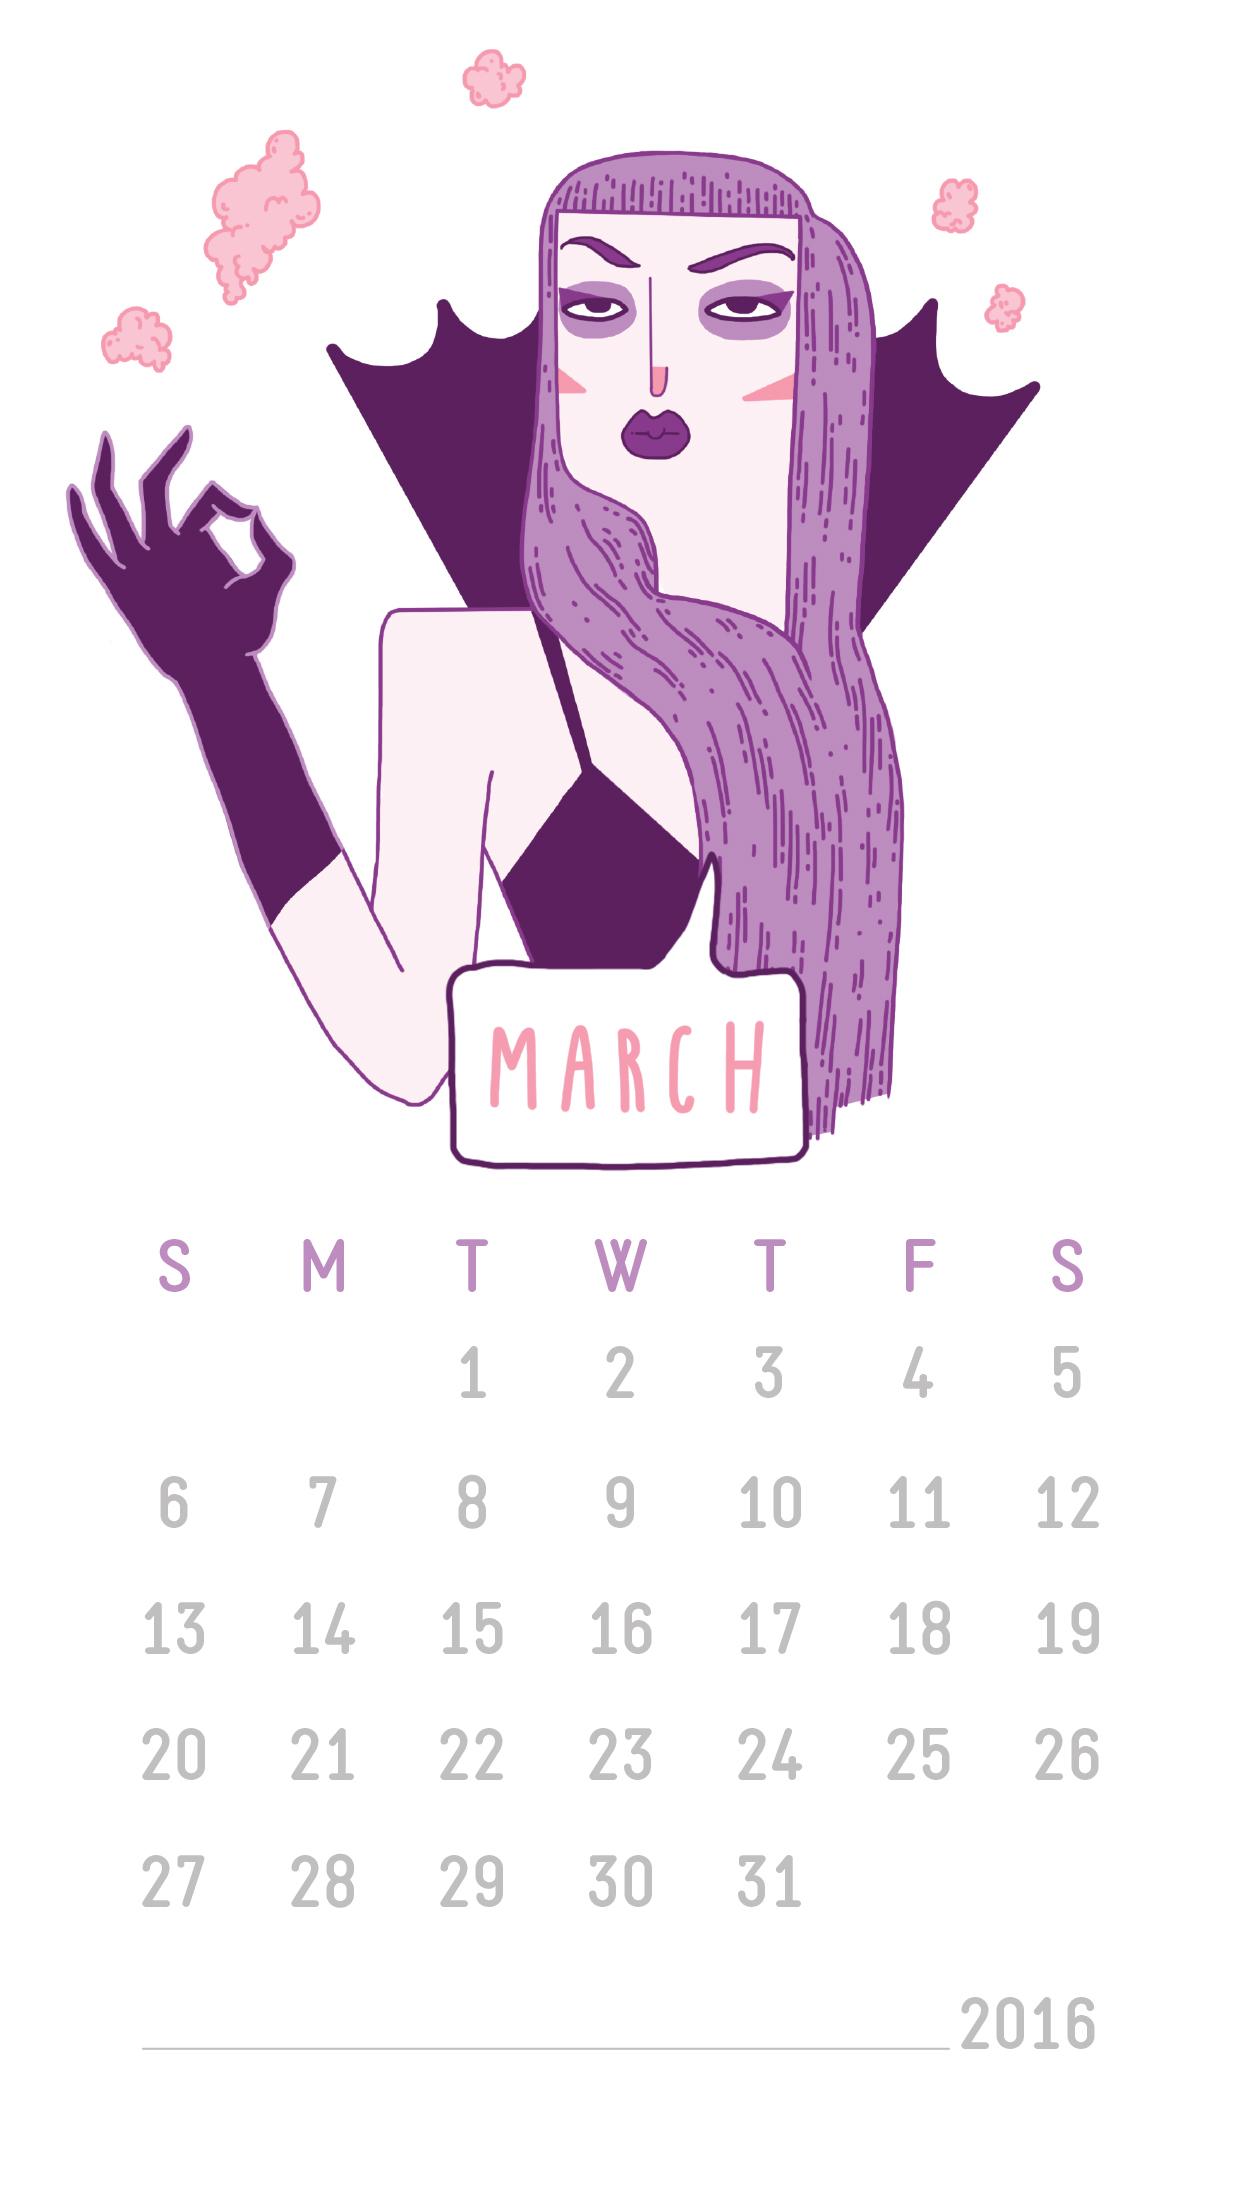 March wallpaper